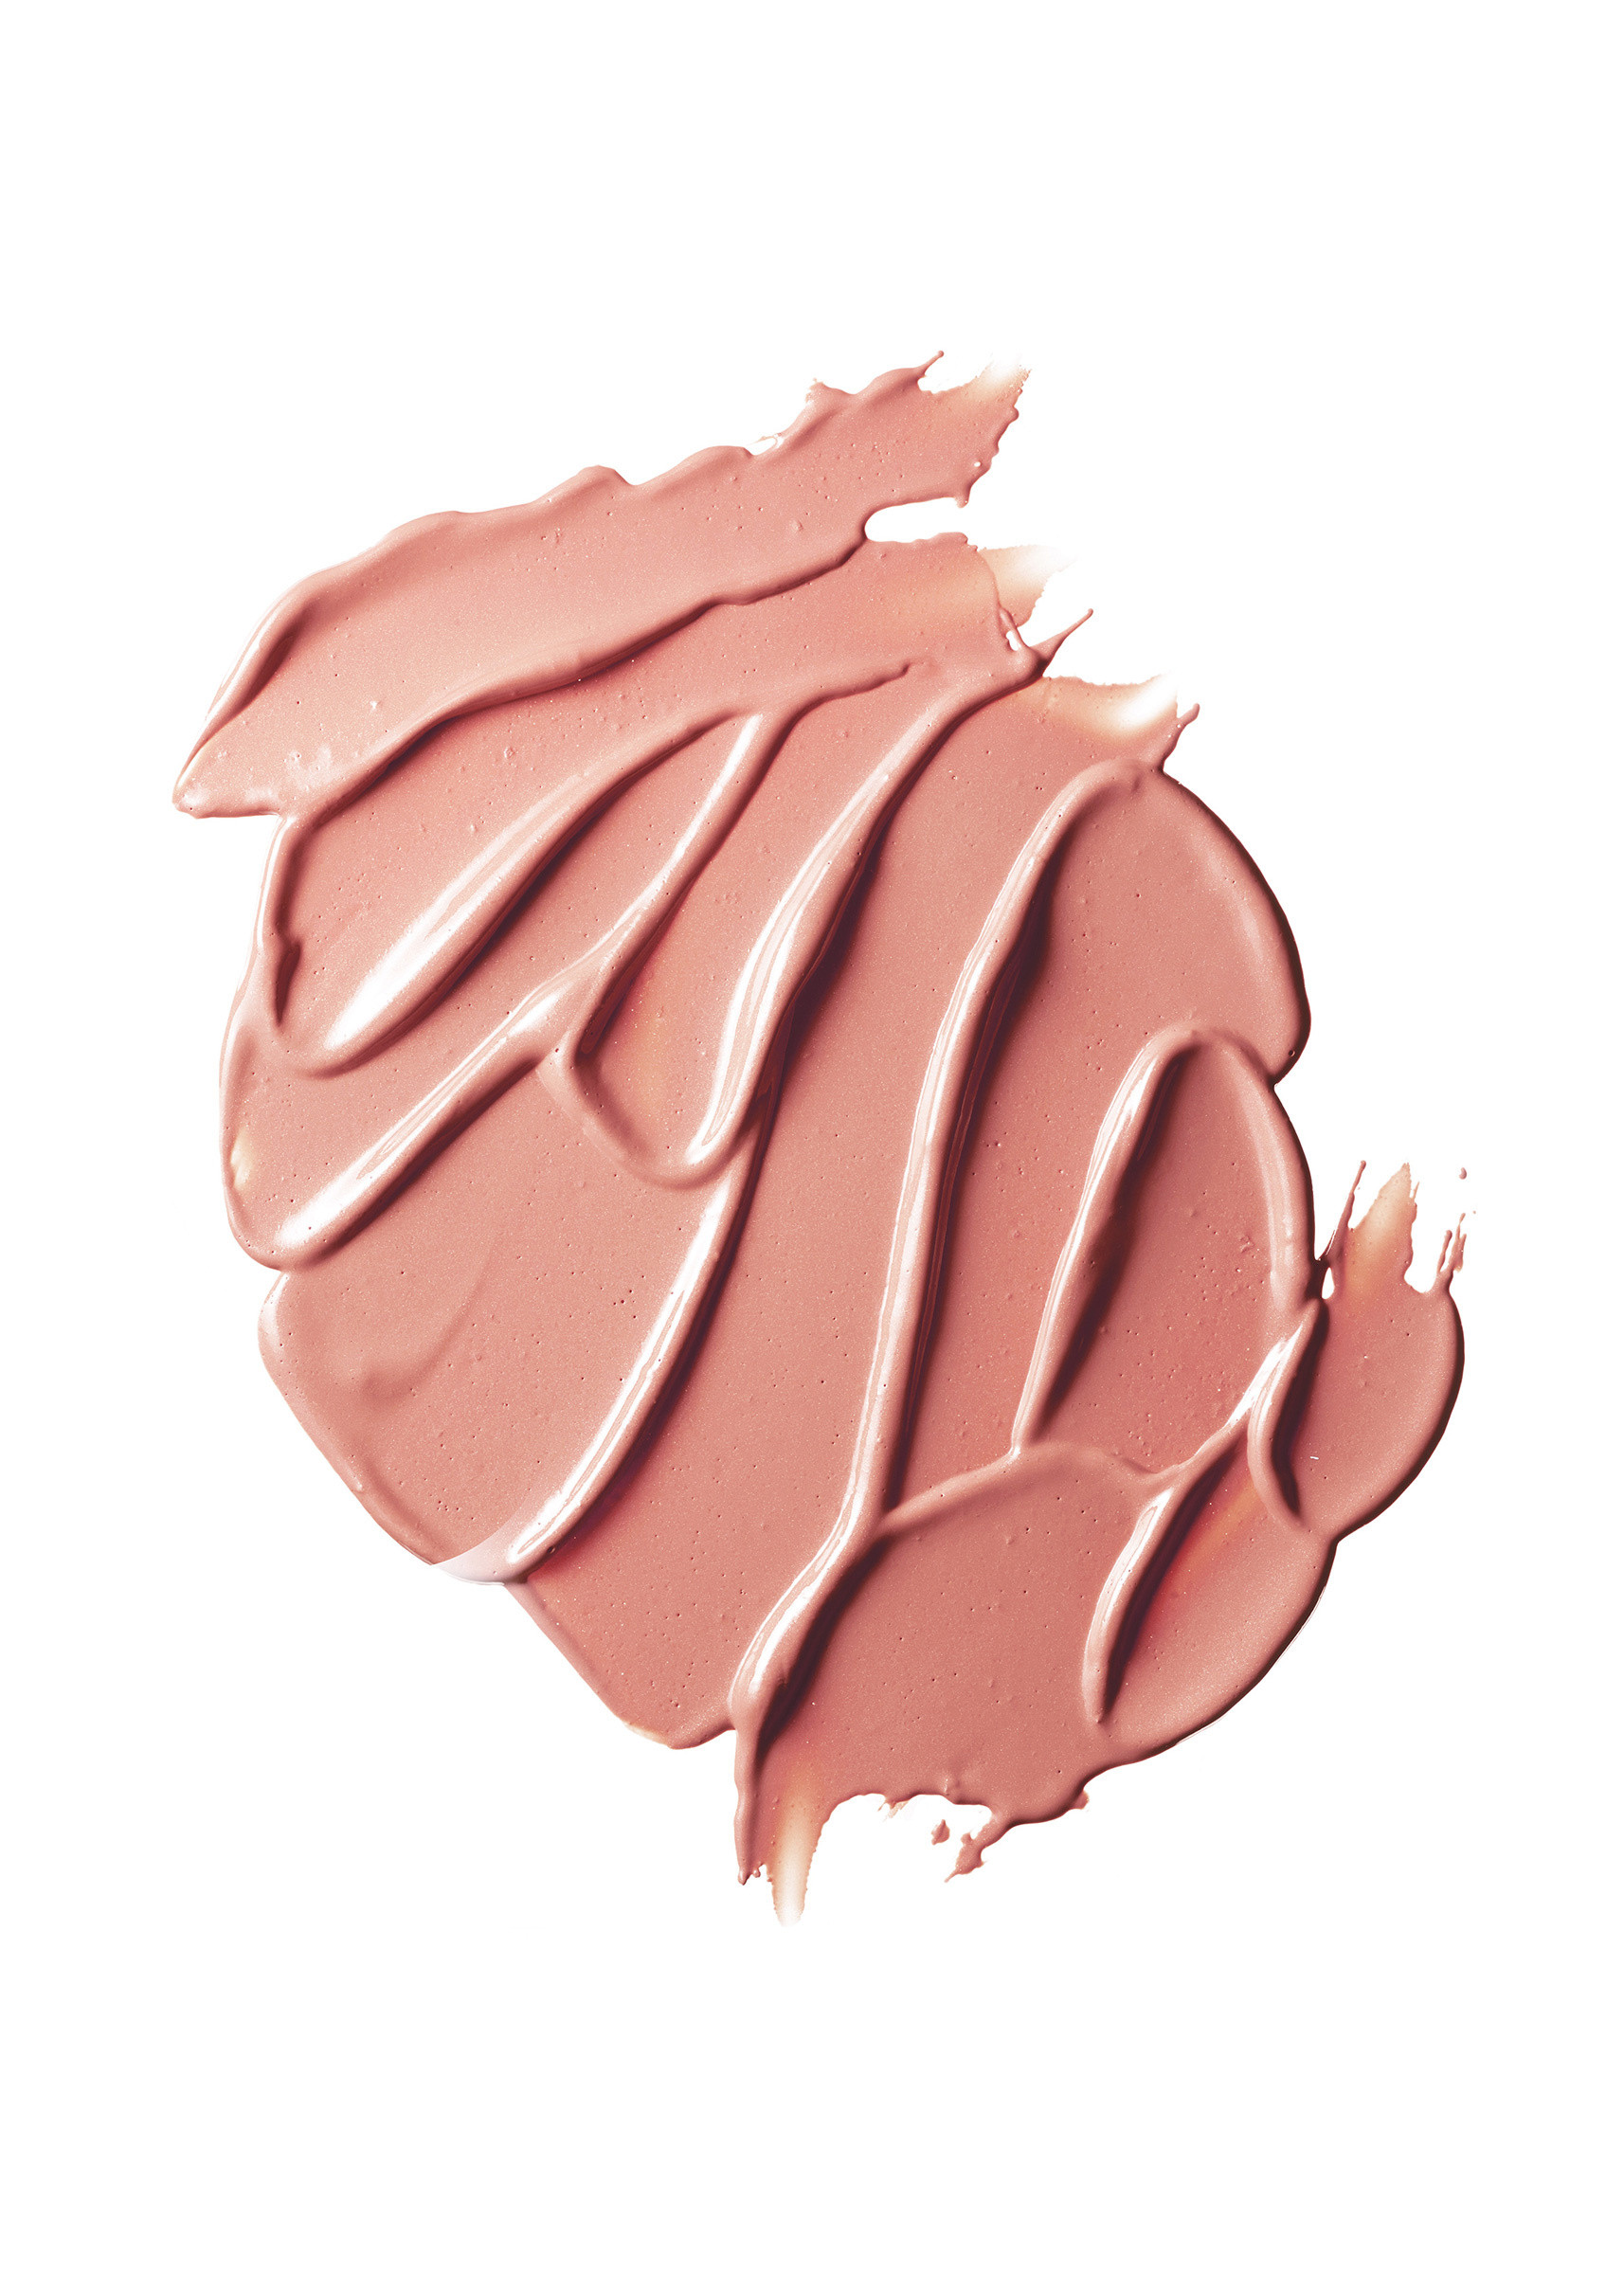 Cremesheen Lipstick - Creme D'Nude, CRÈME D'NUDE, large image number 1